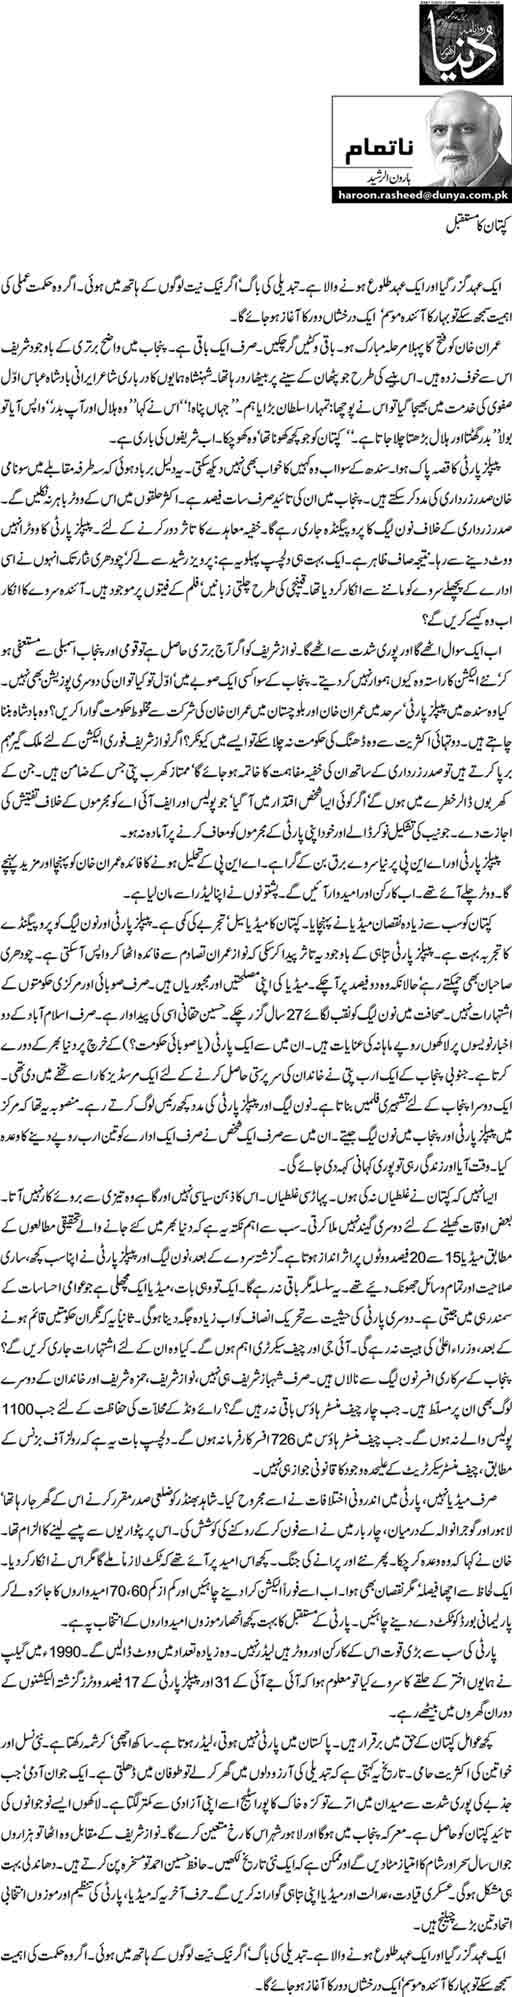 Captain ka mustaqbil - Haroon-ur-Rasheed